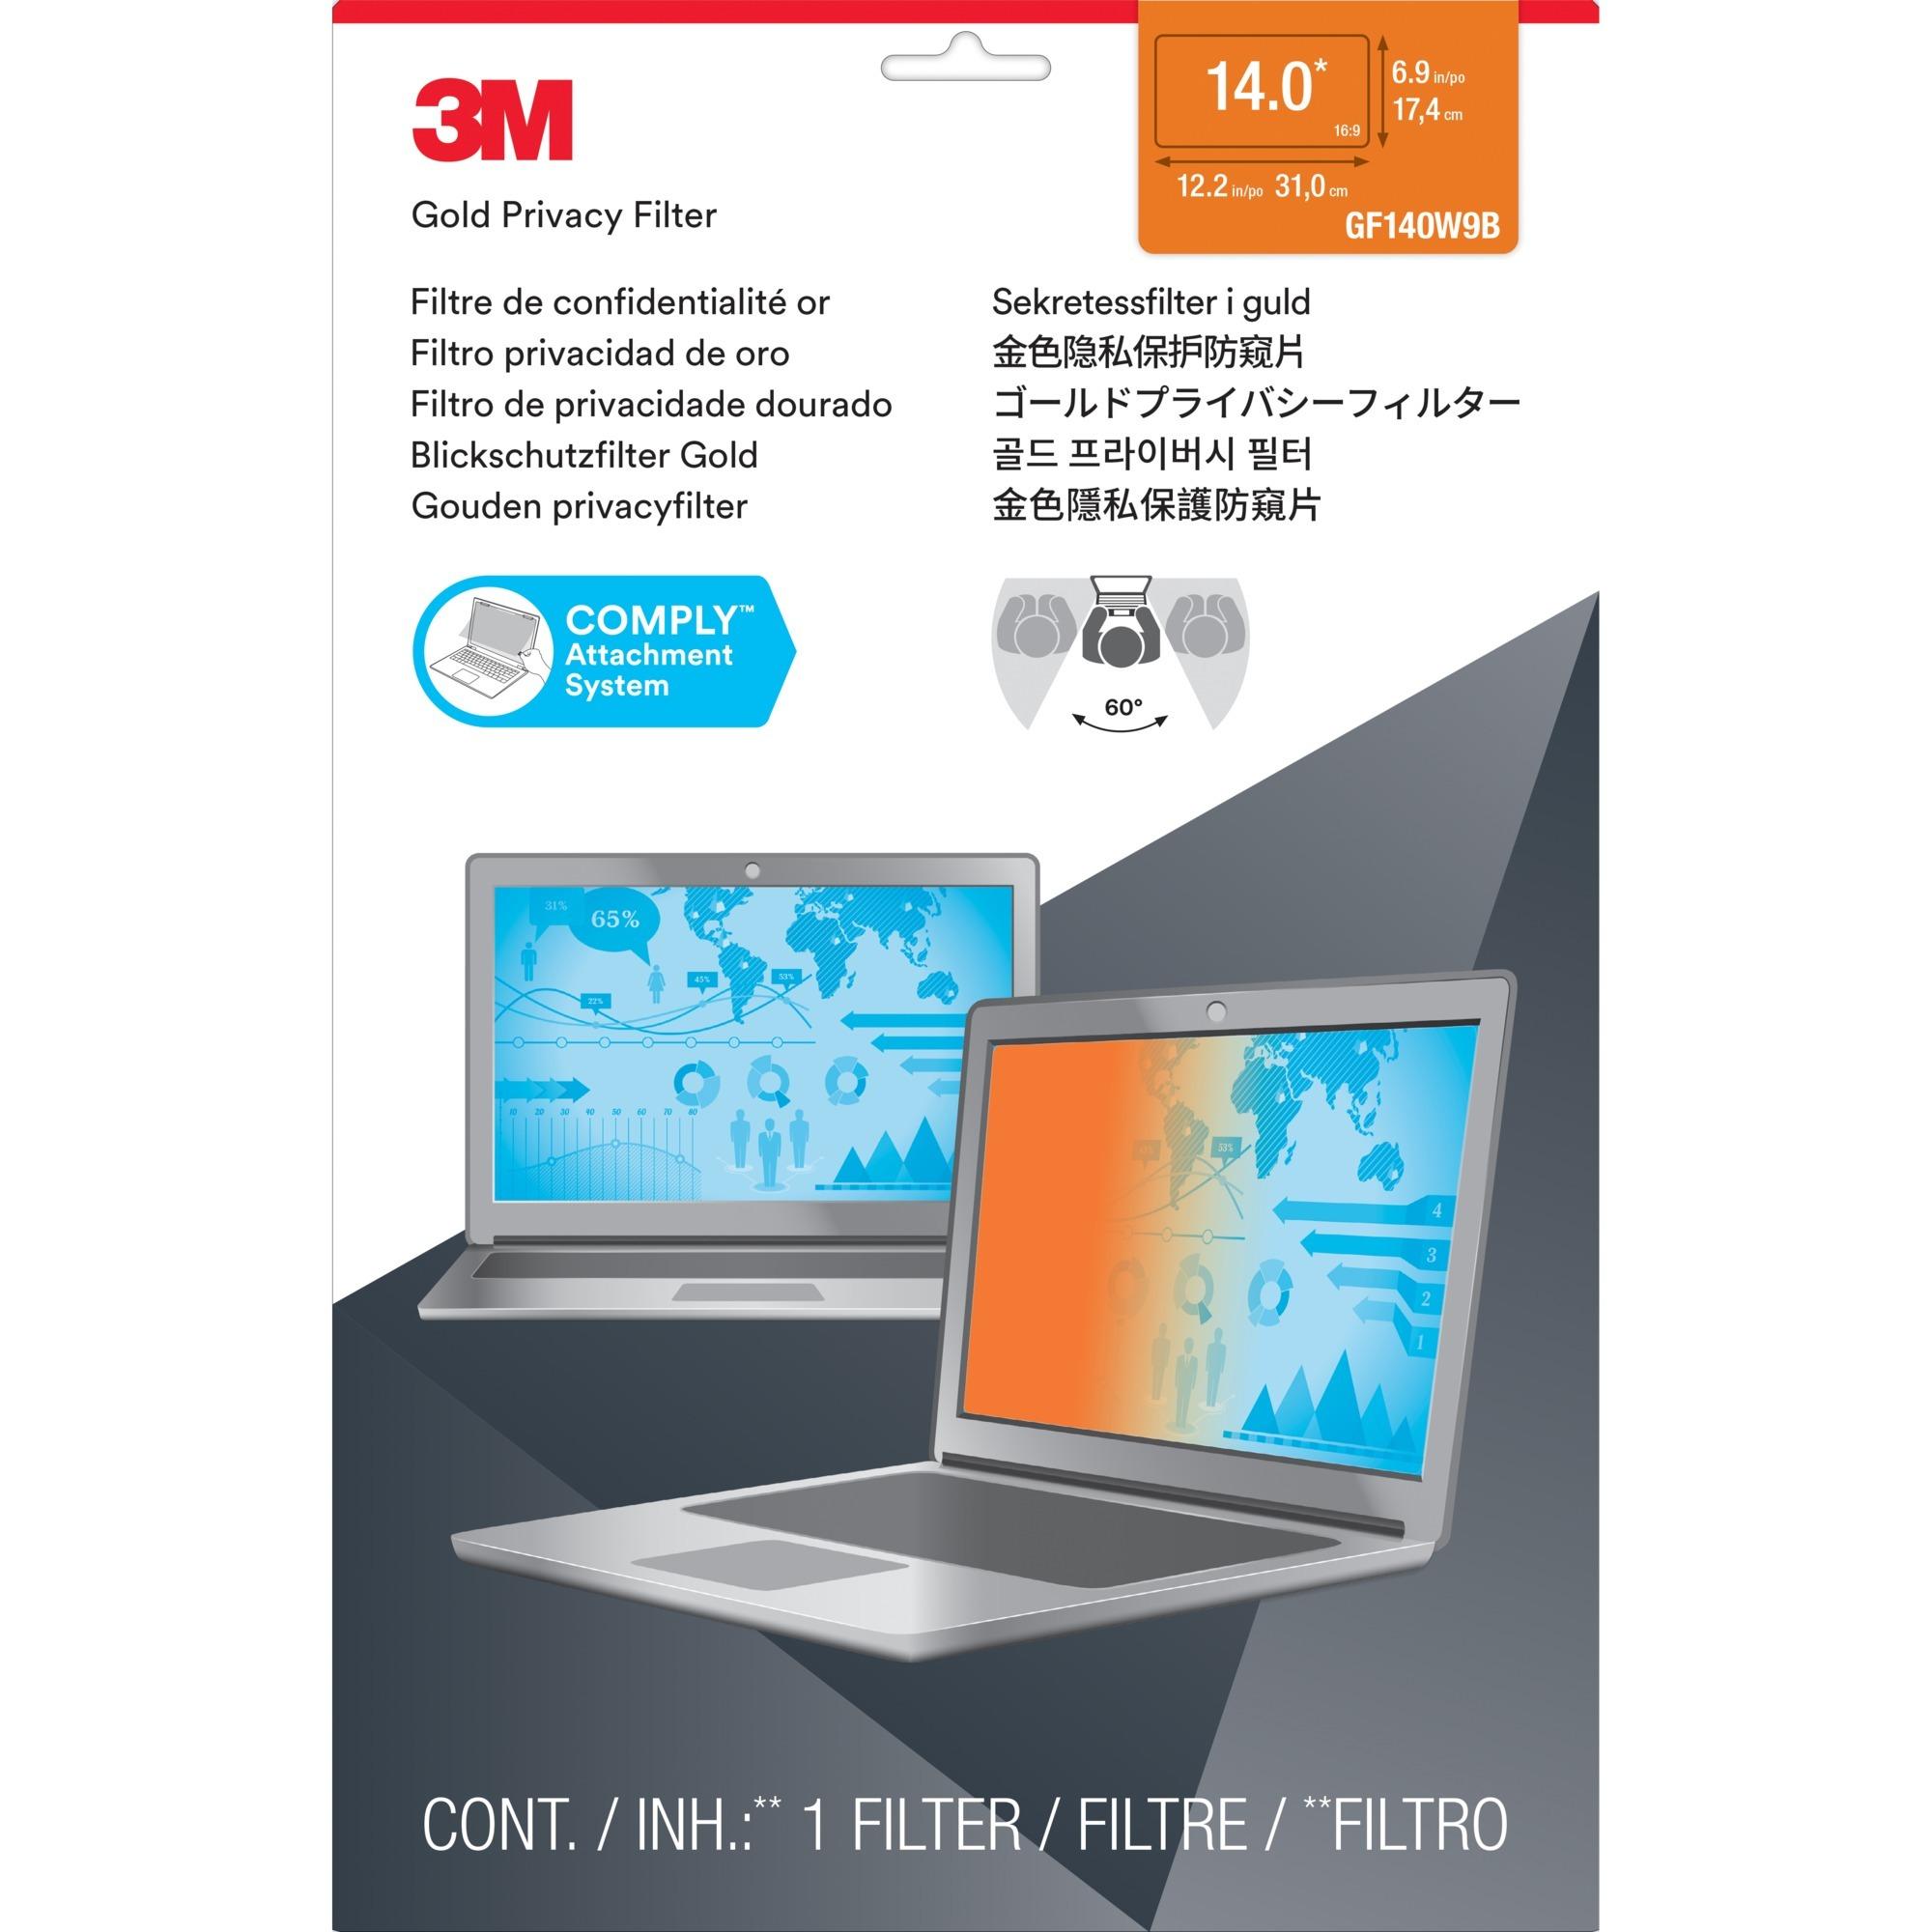 Filtro de privacidad Gold GPF14.0W9 de para ordenadores portátiles con pantalla panorámica...